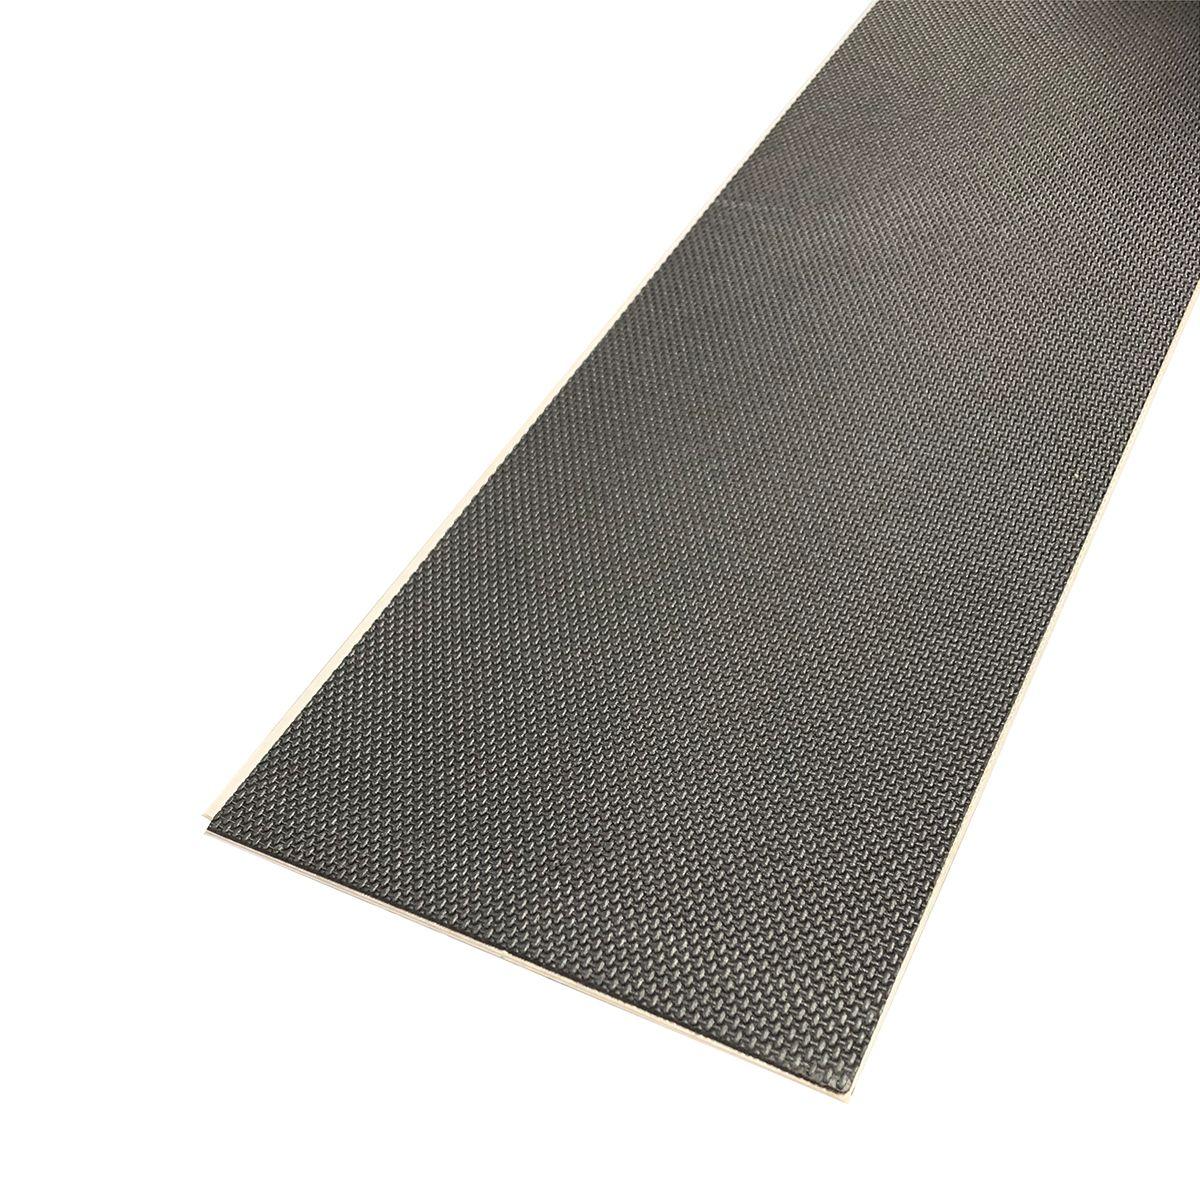 Lame PVC clipsable XXL chêne naturel clair 5mm Teramo